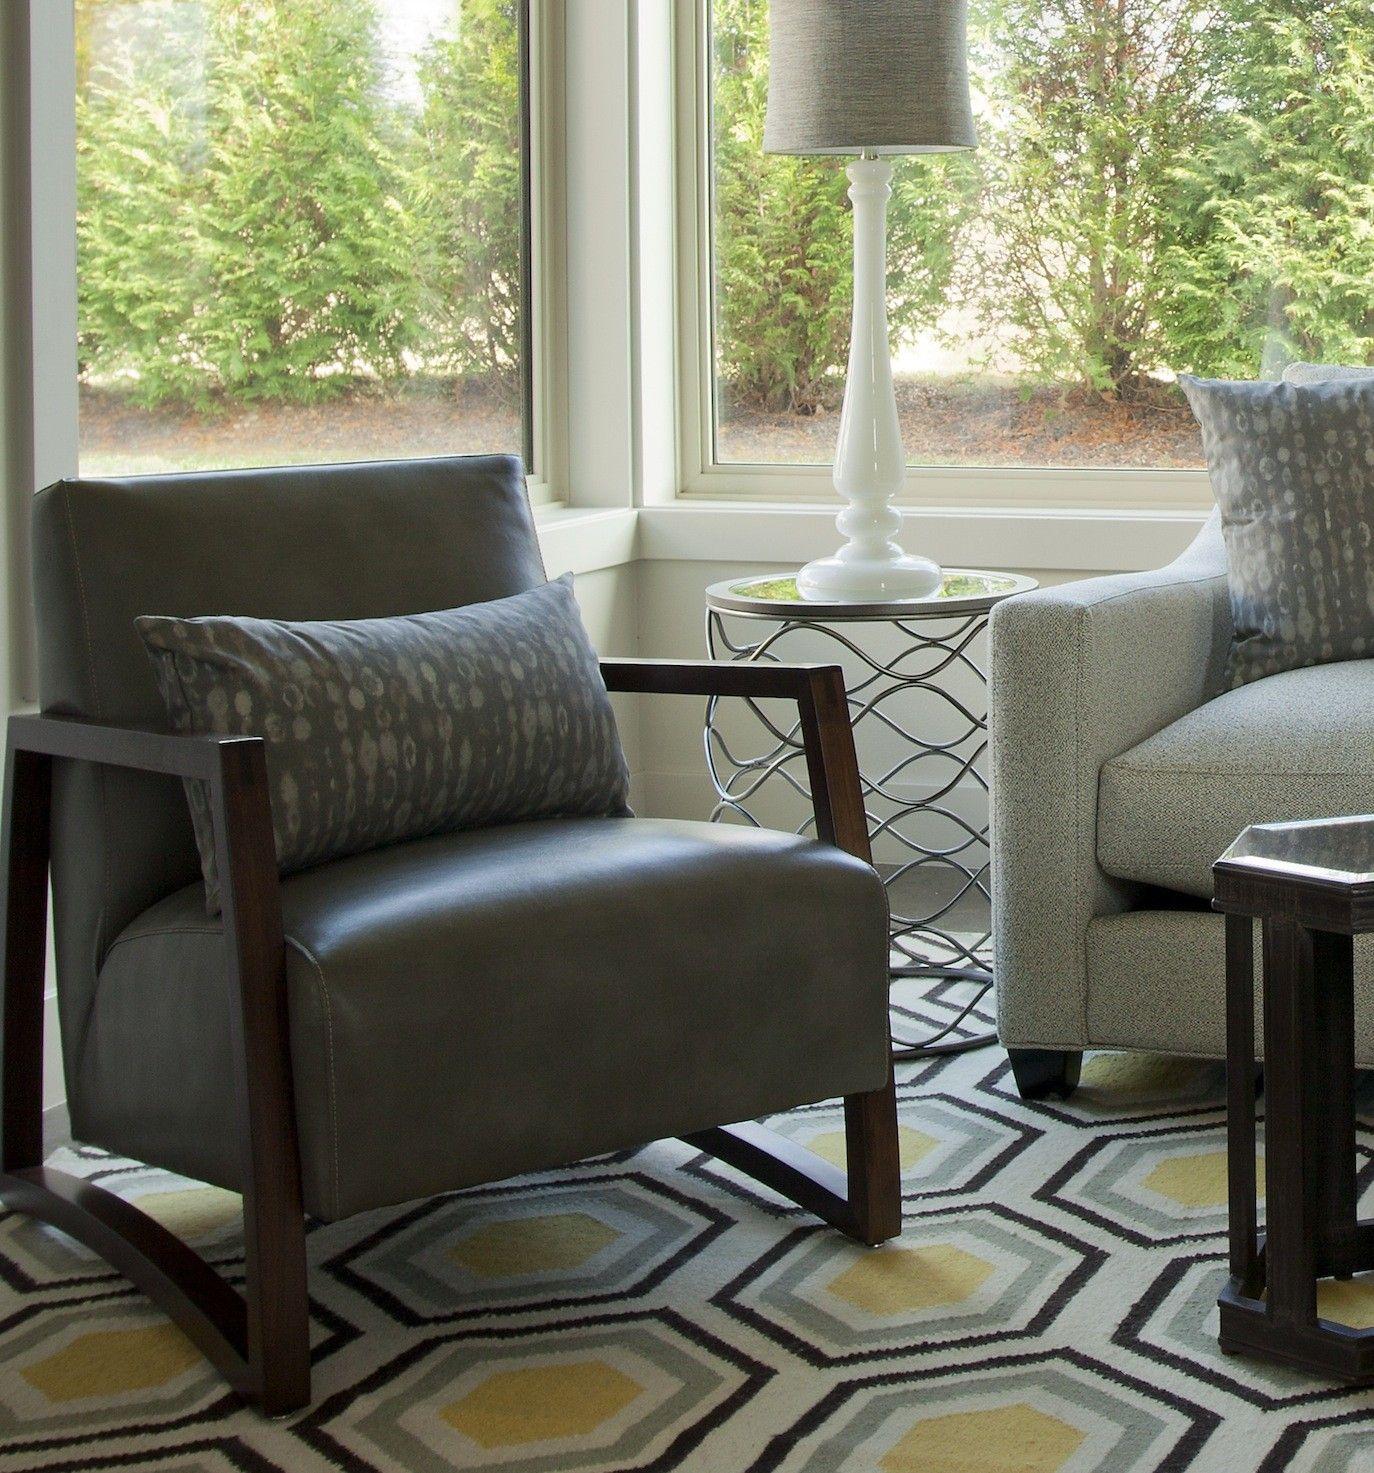 Merveilleux Ingram Chair   I.O. Metro Furniture, Art U0026 Accessories